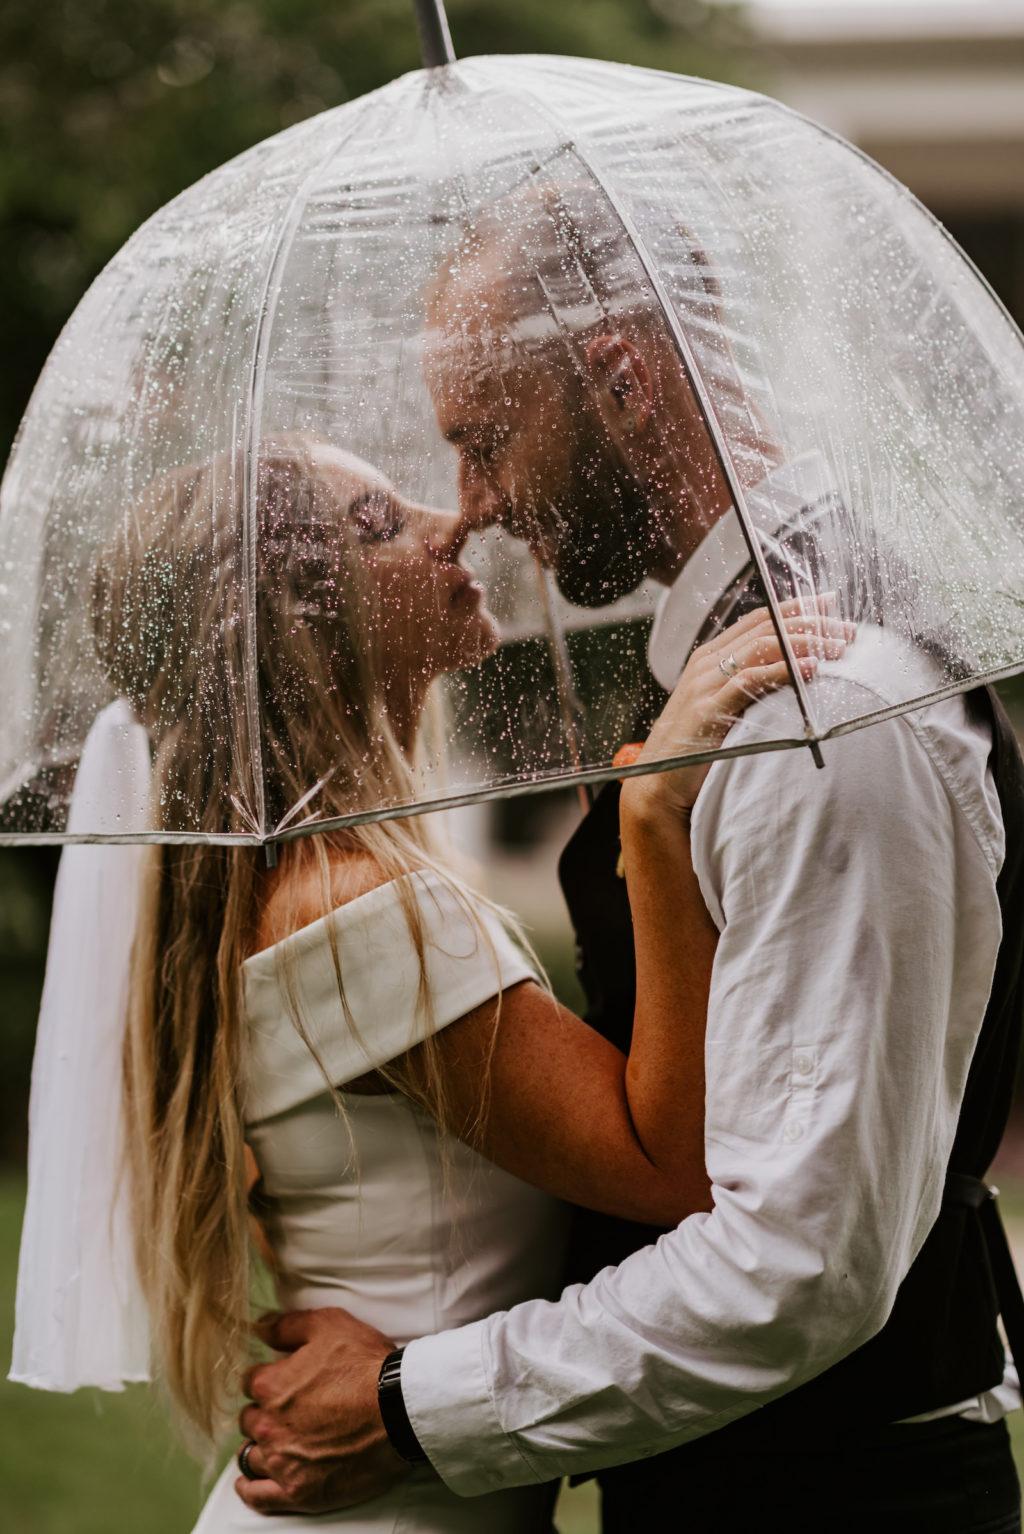 Intimate Bride and Groom Photo Under Clear Umbrella